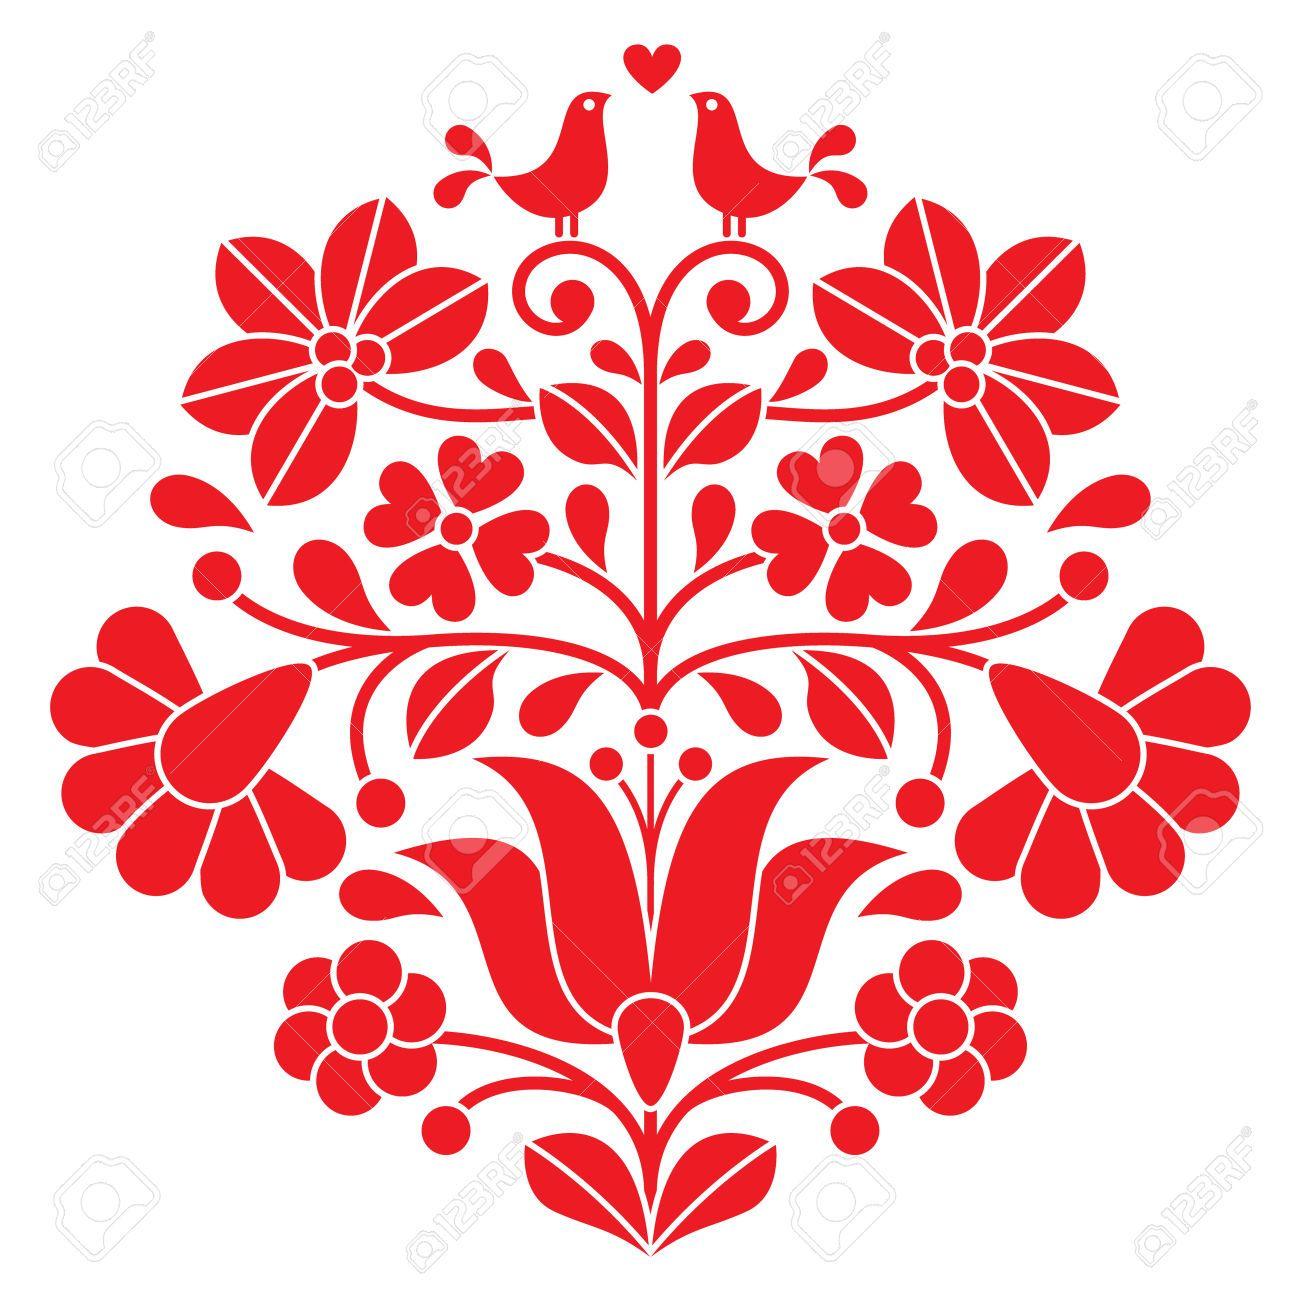 Kalocsai bordado rojo patrón floral popular húngaro con las aves